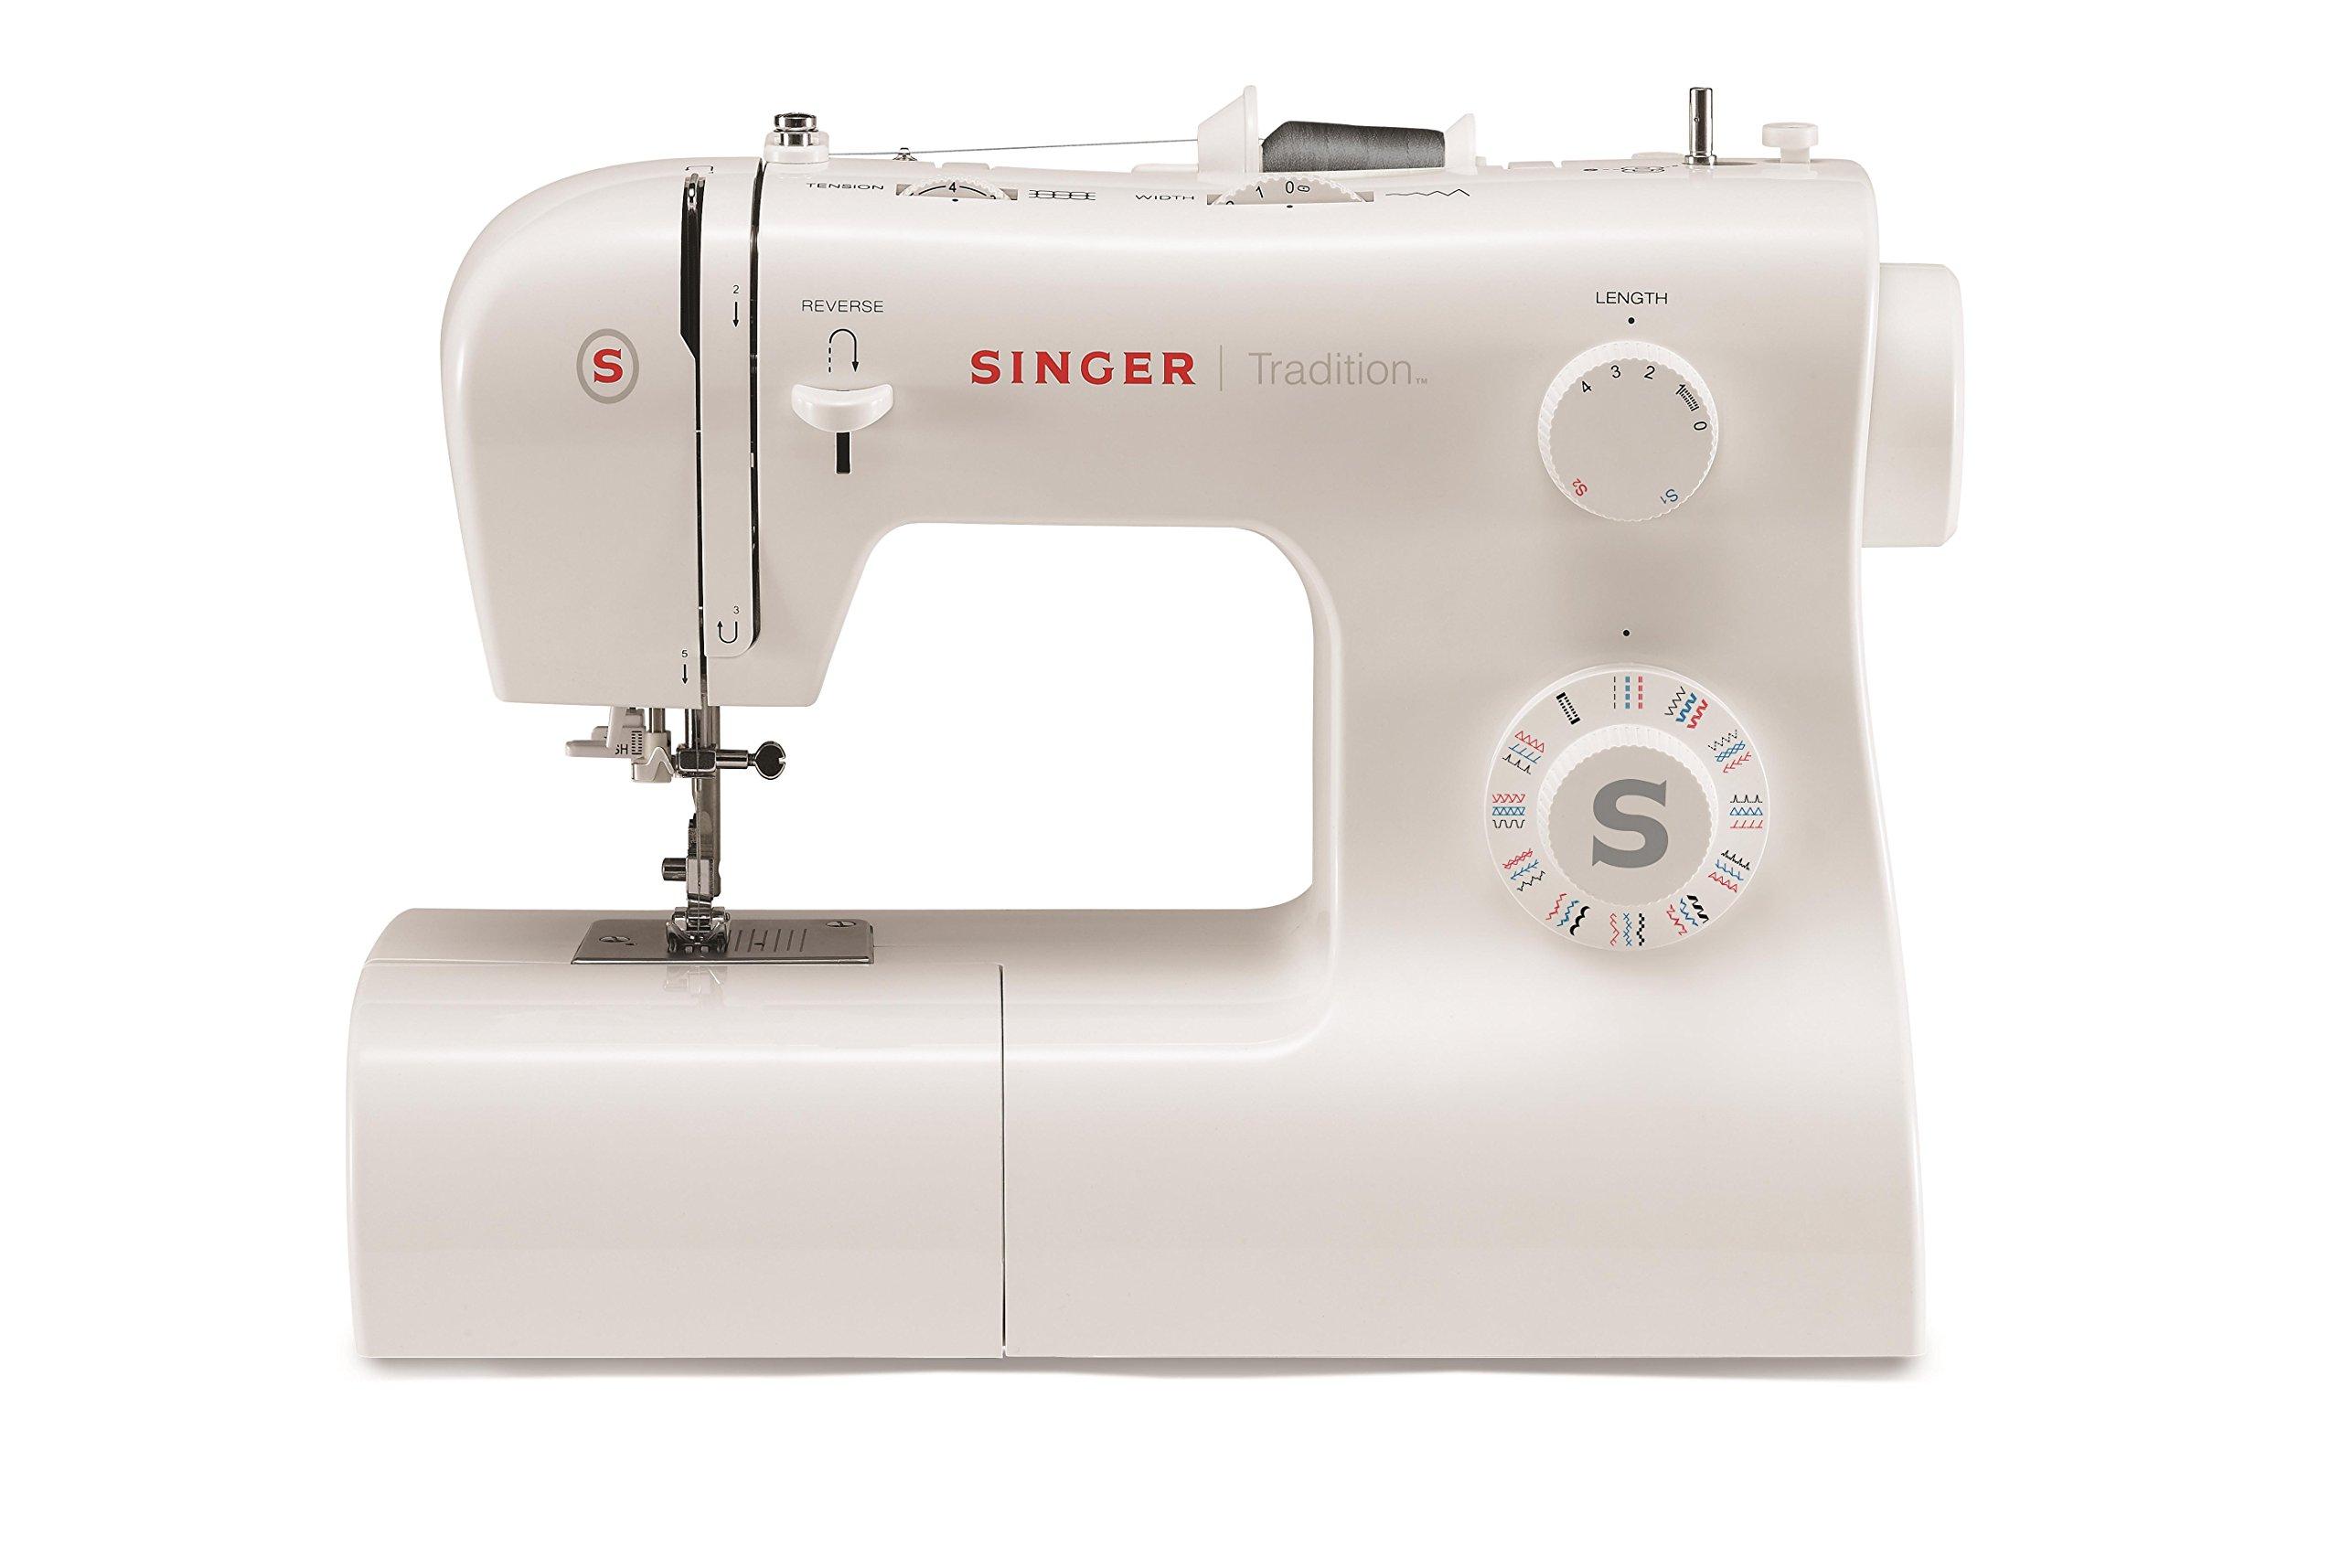 Singer 2282 Tradition - Máquina de coser mecánica, 32 puntadas, Blanco product image